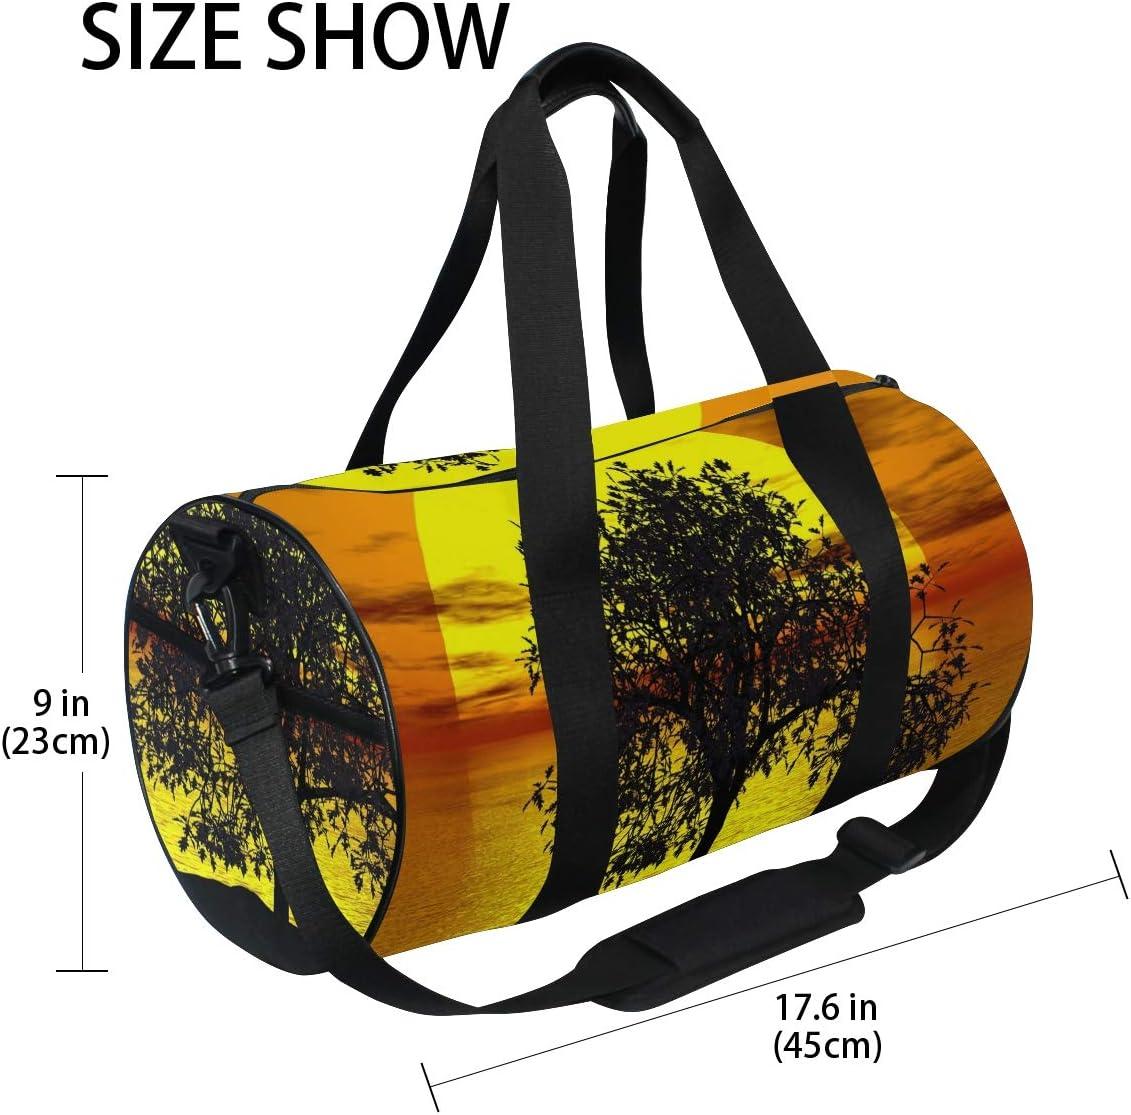 Sunset Tree Landscape Sports Gym Duffel Bag Travel Duffle Bag Sports Luggage Handbag for Men Women Girls Boys